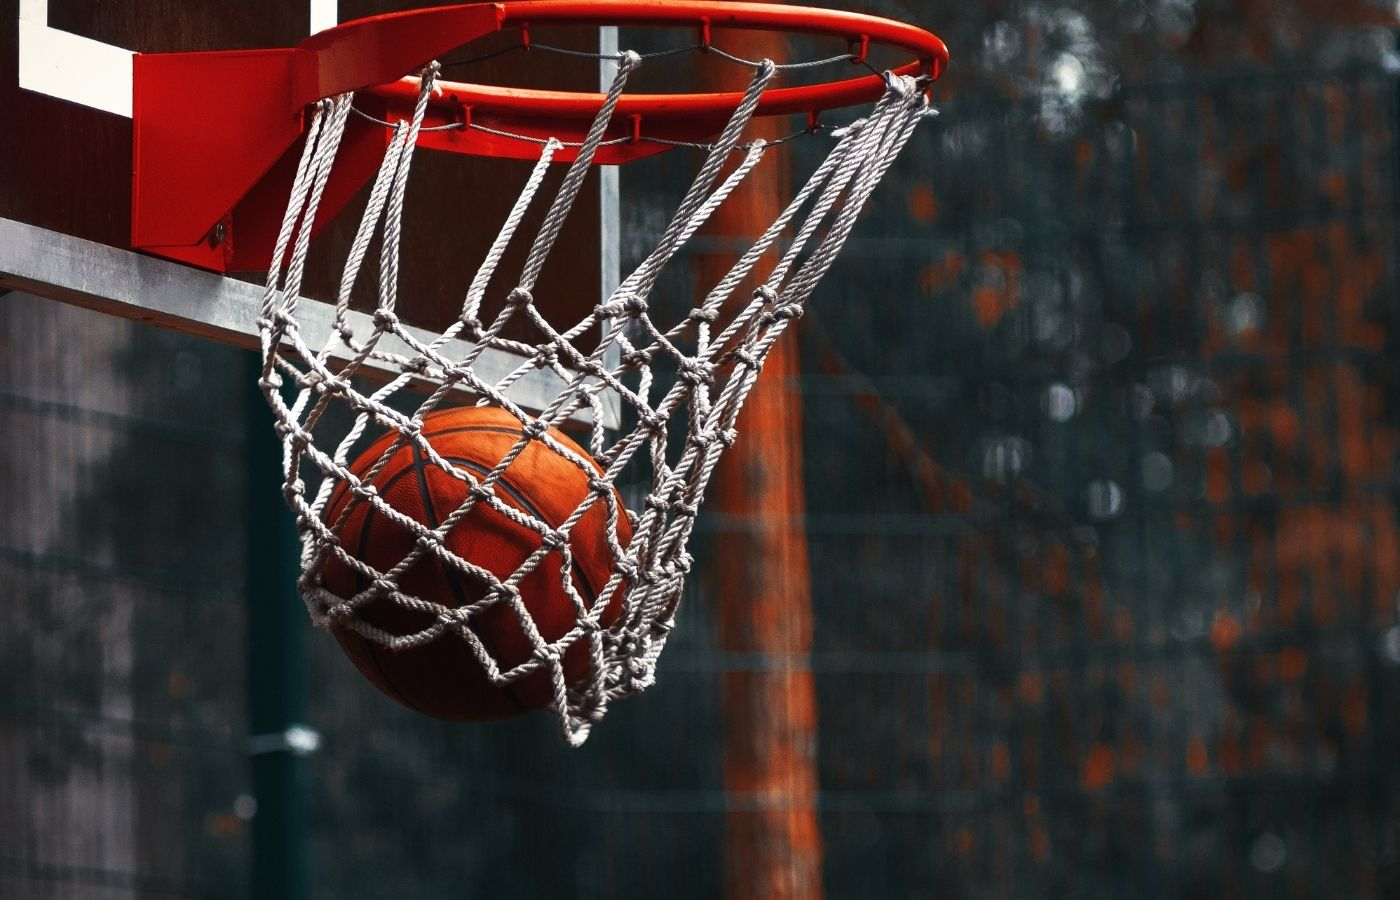 Proč nemá NBA stále vyhráno? | Sportbiz